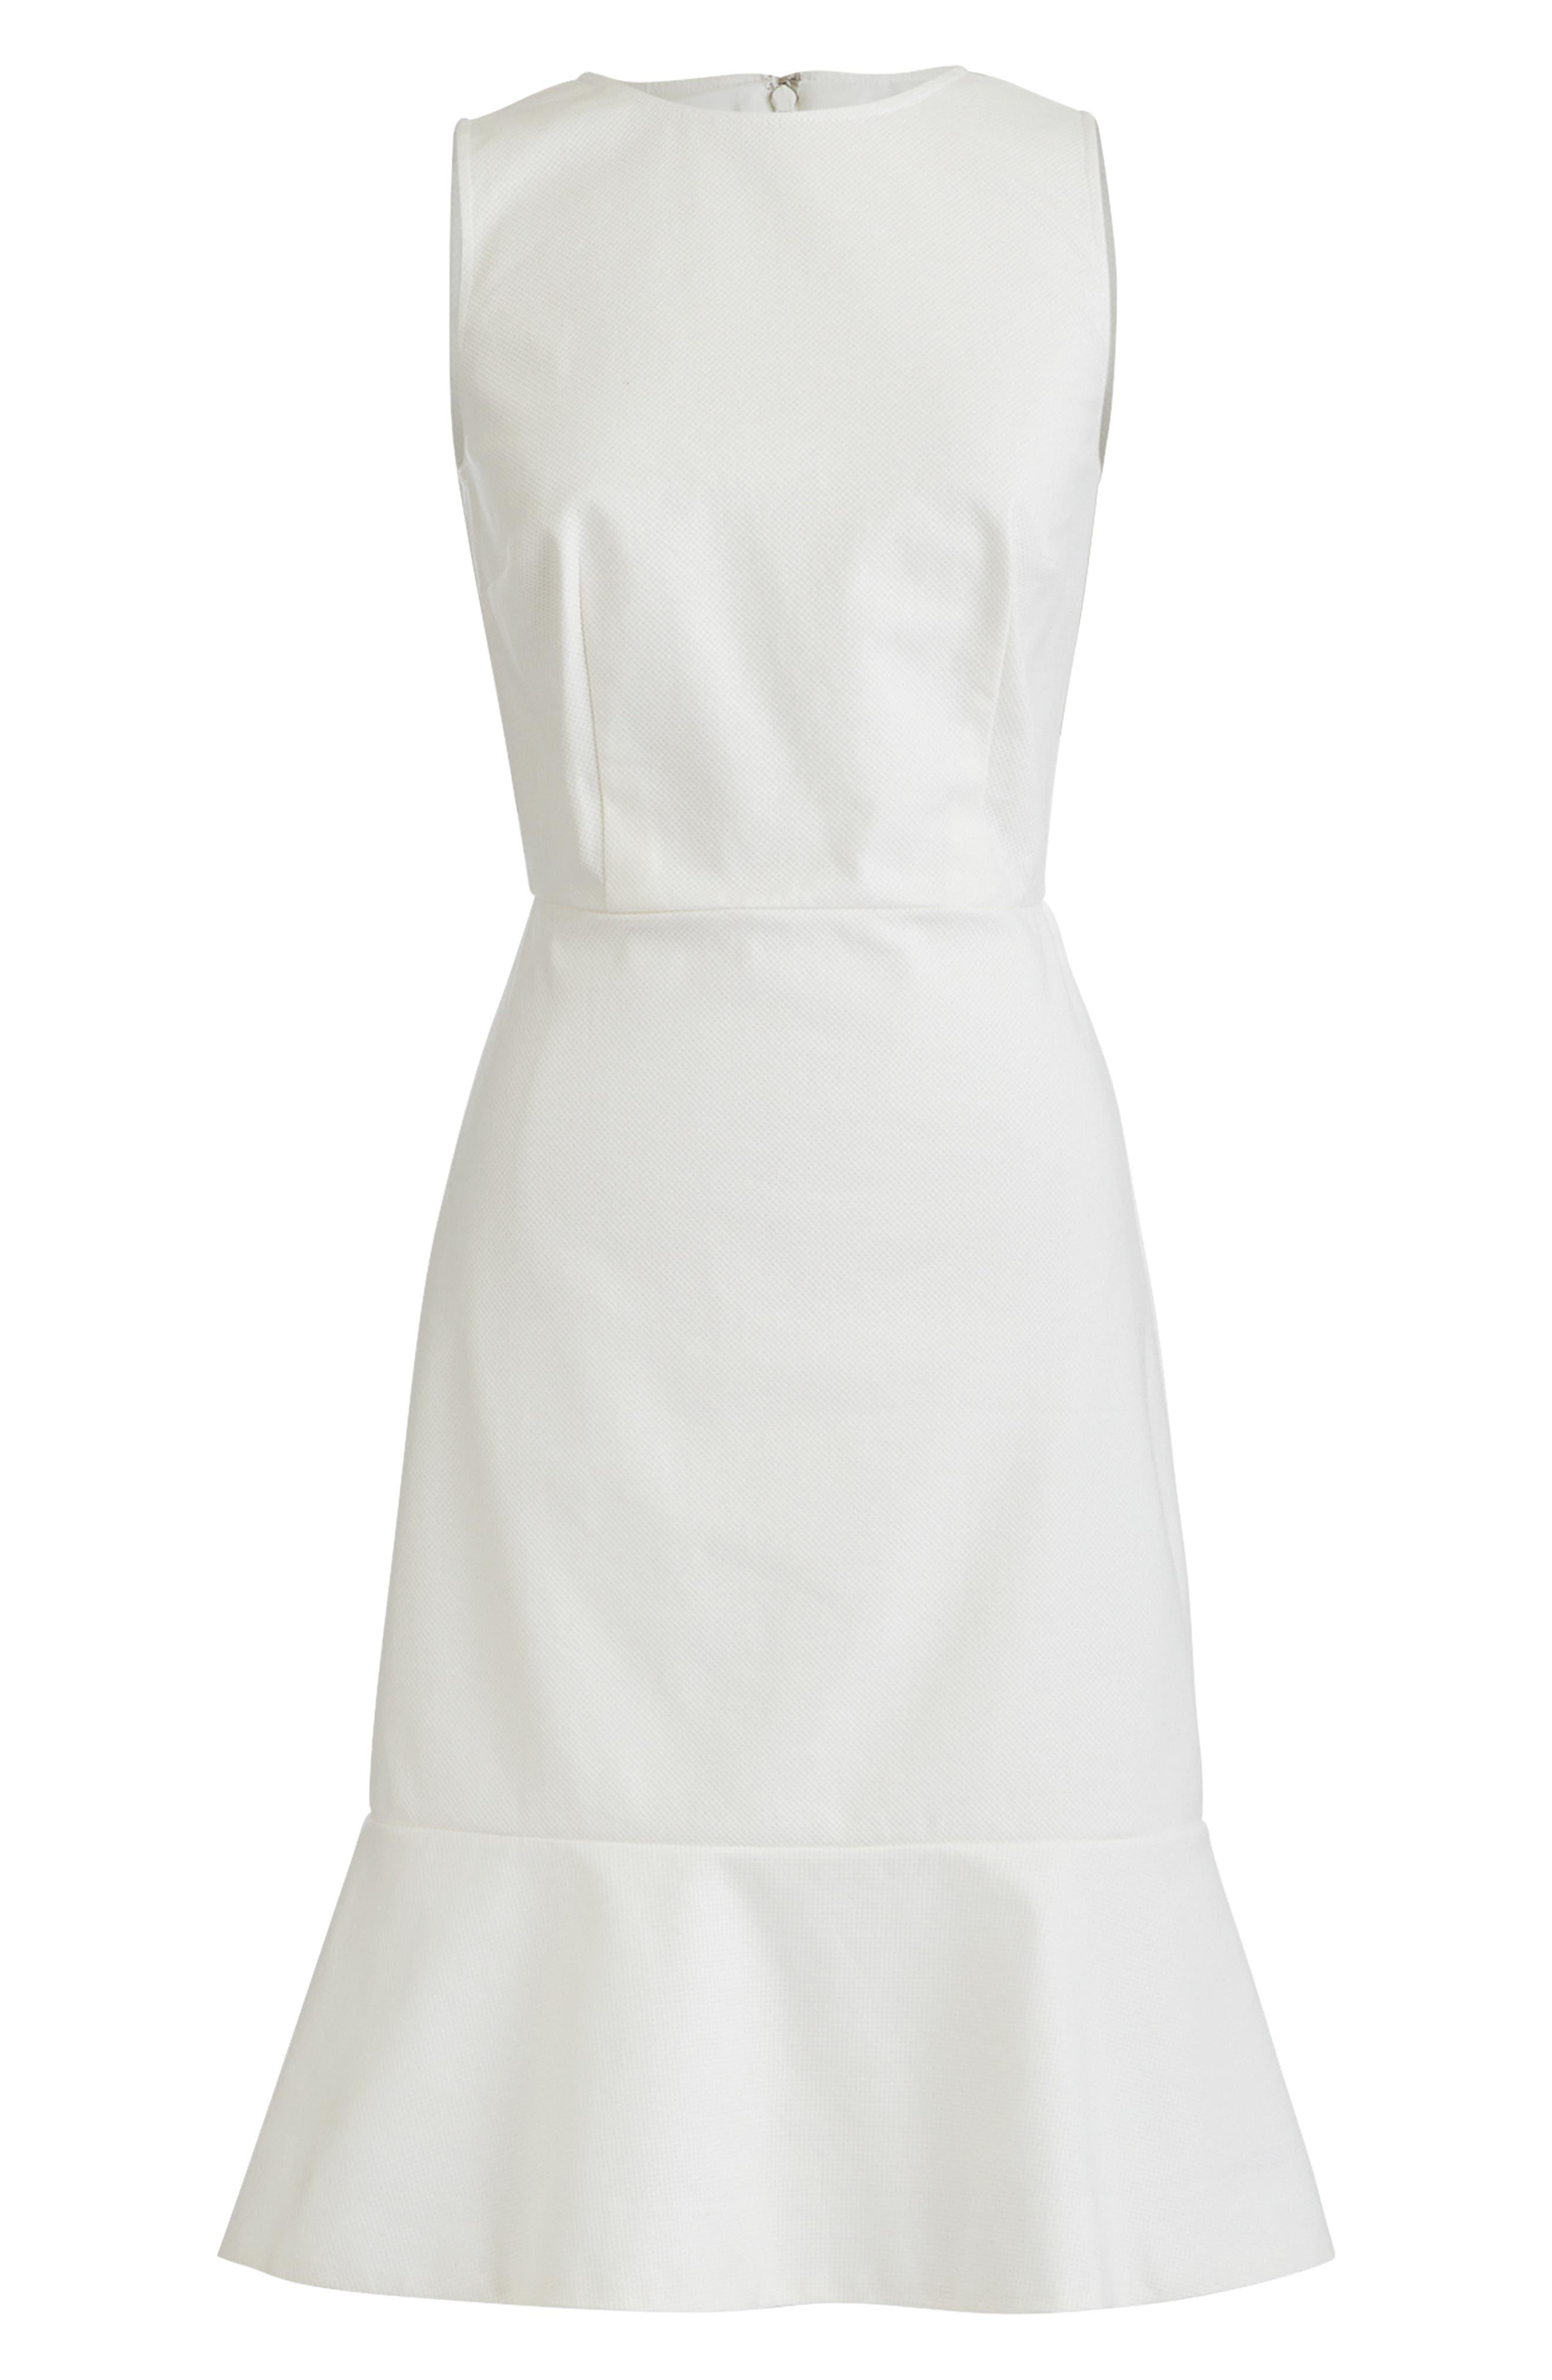 J.crew Fluted Hem Stretch Pique Sheath Dress, Ivory